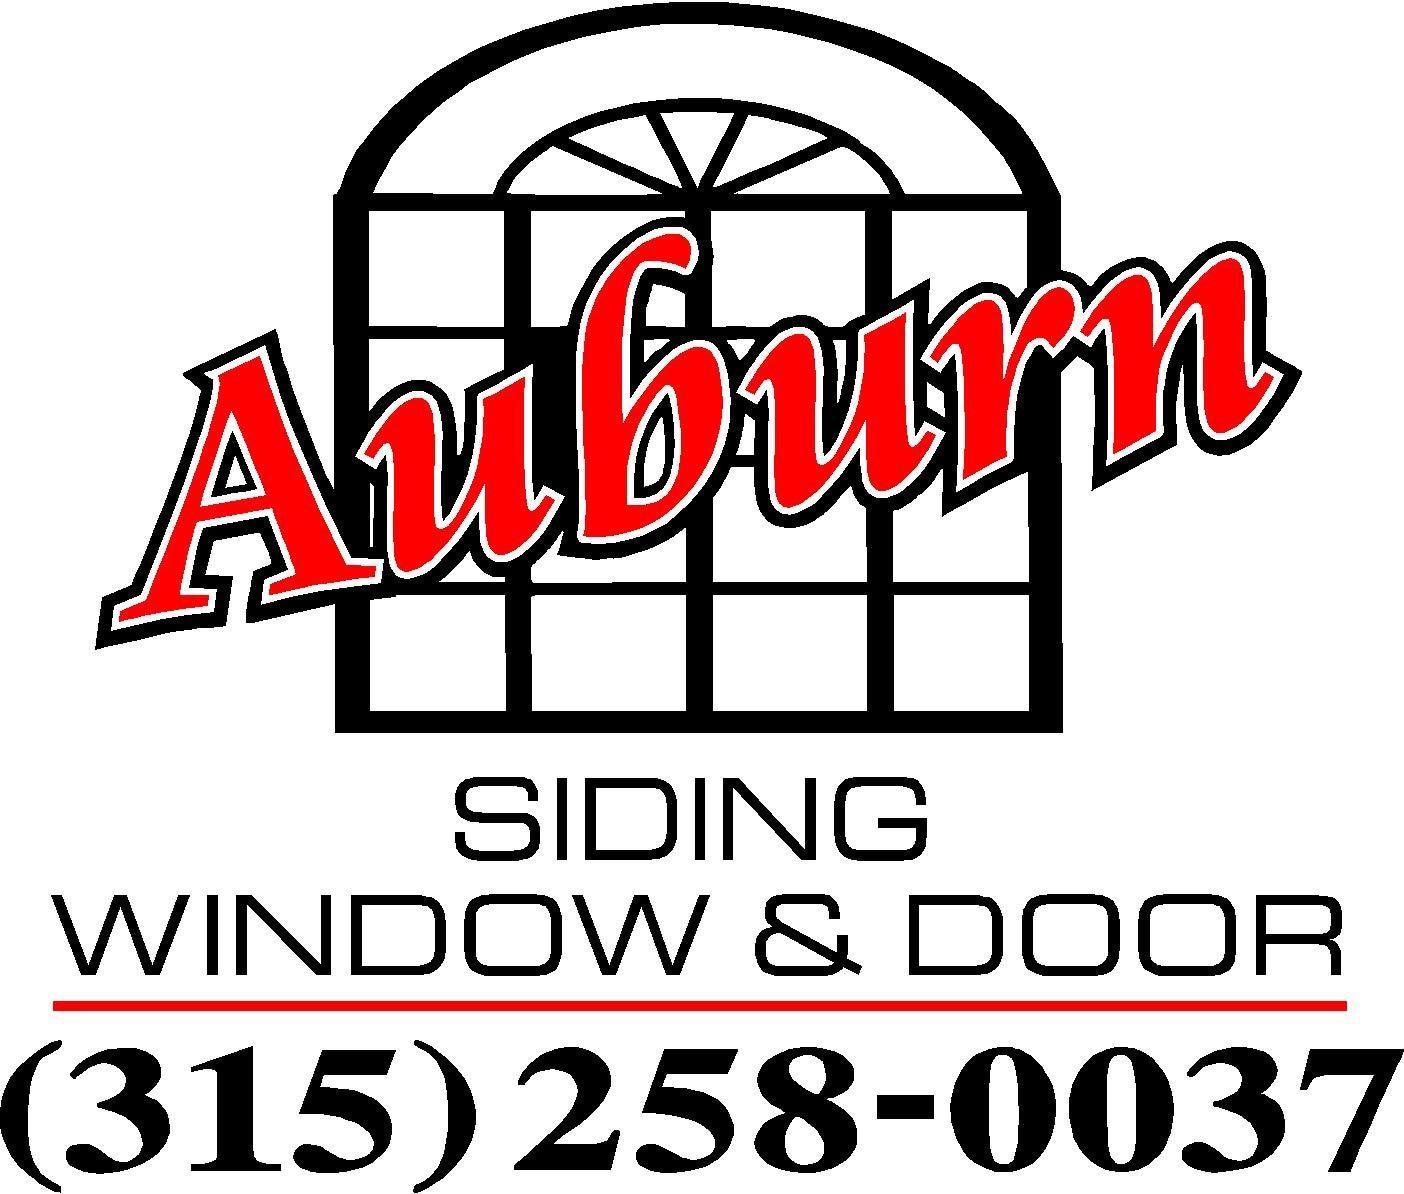 Auburn Siding Window & Door